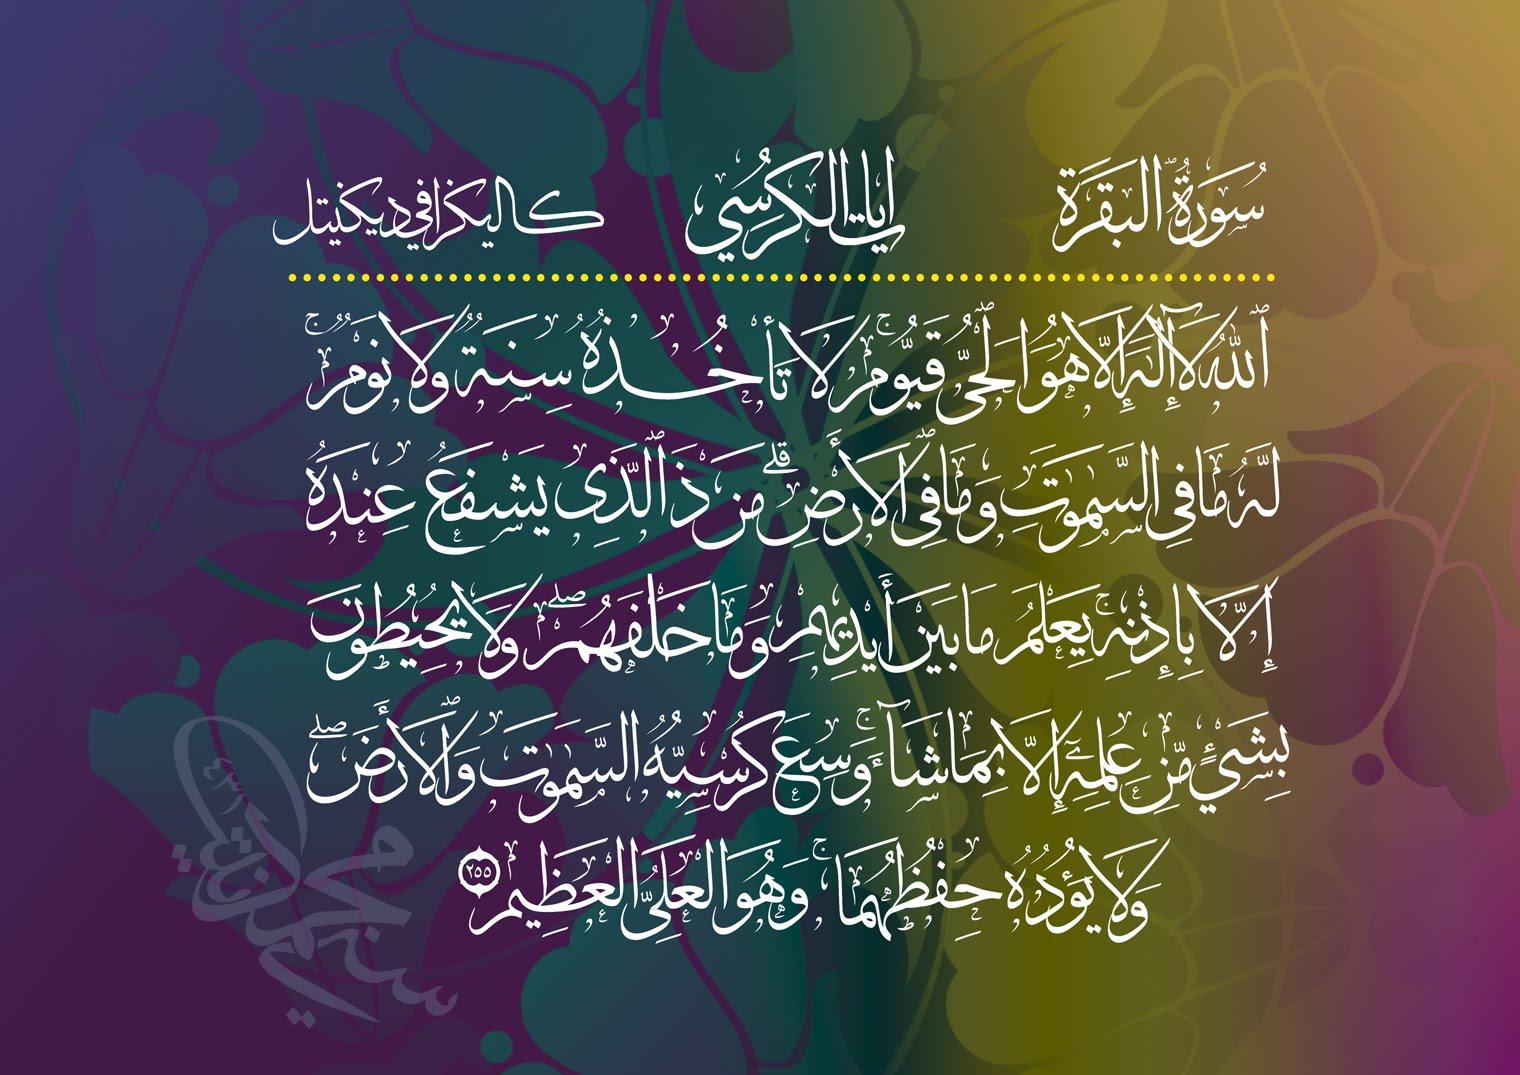 Wallpapers iphone quran - Aayat Ul Kursi Ki Fazeelat Aur Barkatein